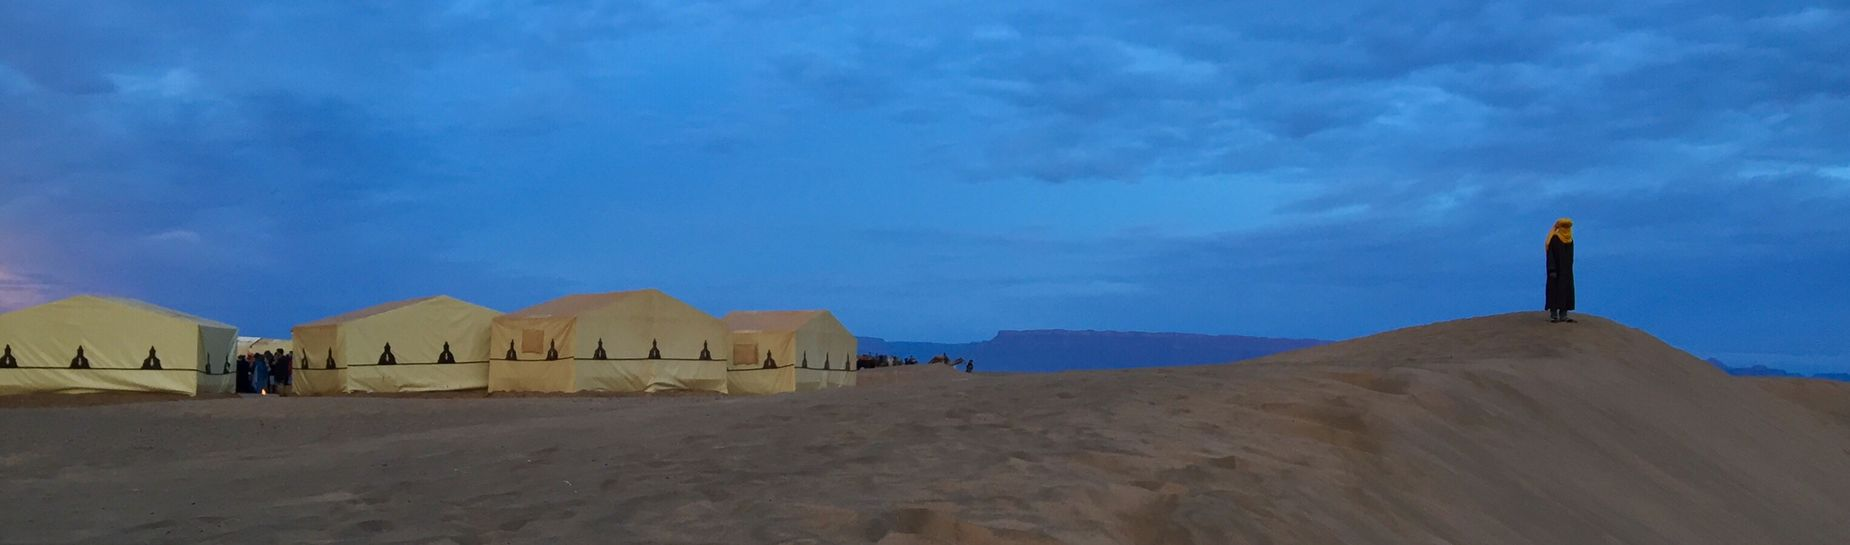 Sand Sand Dune Tuareg Berber  Sahara Desert Look-out Morocco Maghreb Man In The Desert NOMAD Yellow And Blue North Africa Dawn Desert Landscape Desert Sunrise The Week On EyeEm